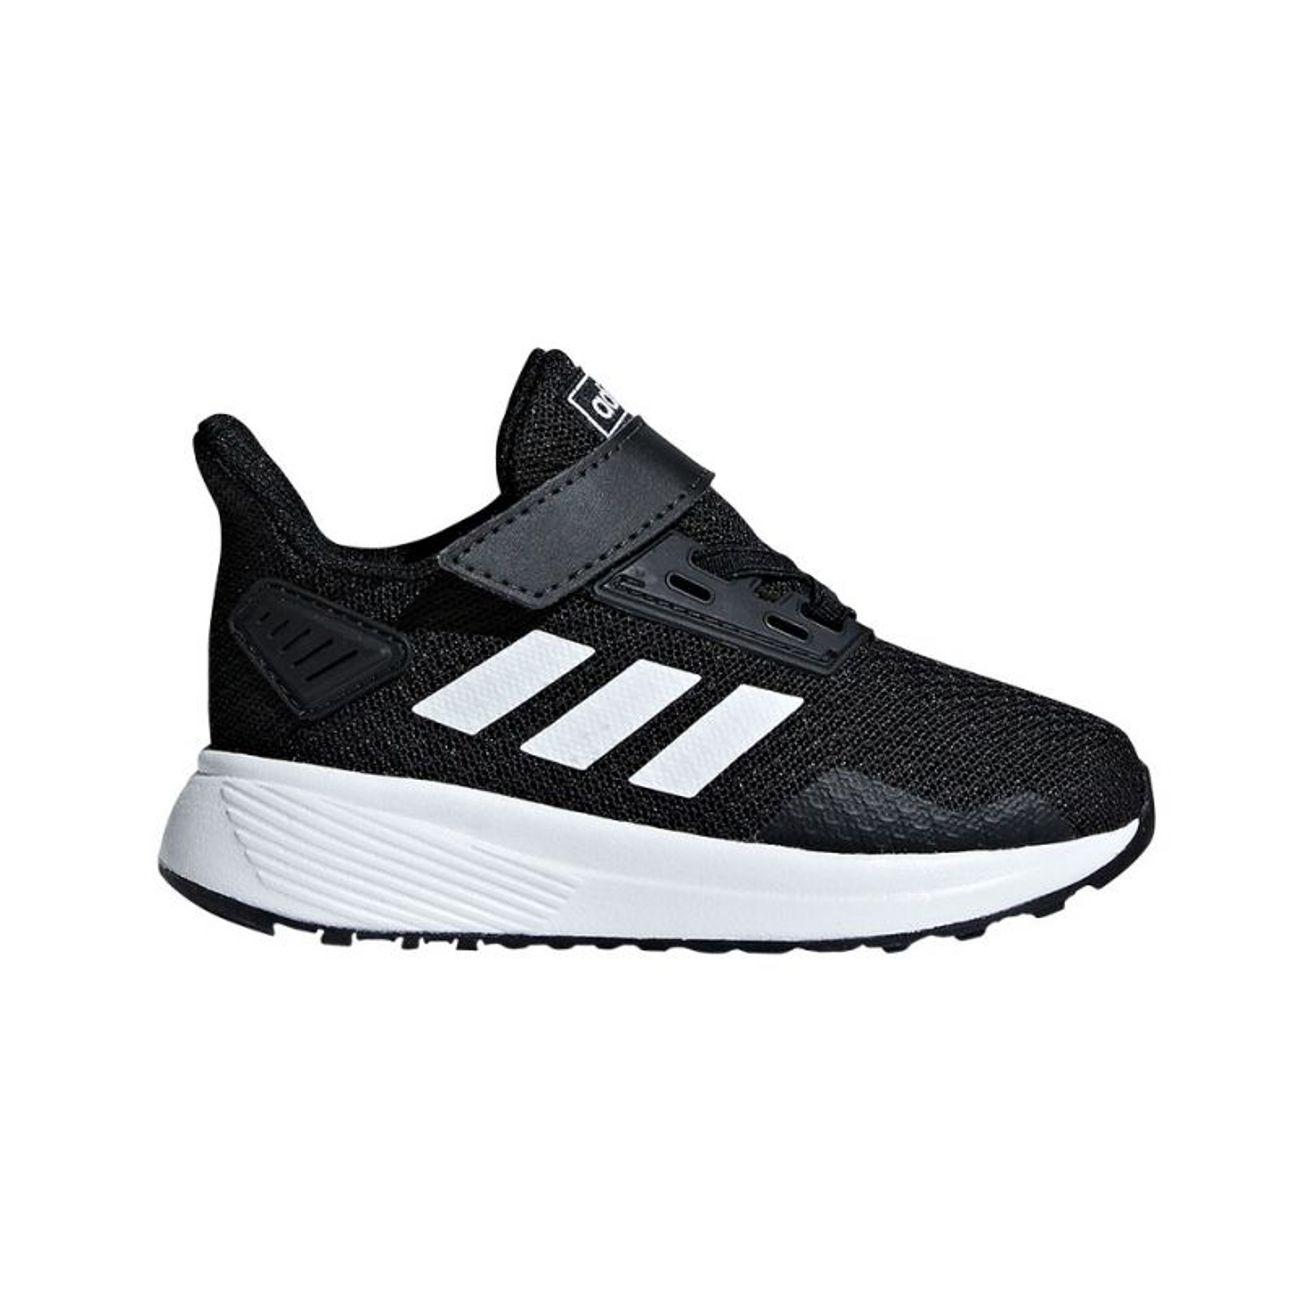 Bc0824 Duramo Padel Gris Adulte Adidas Enfant 9 qMSUzpV